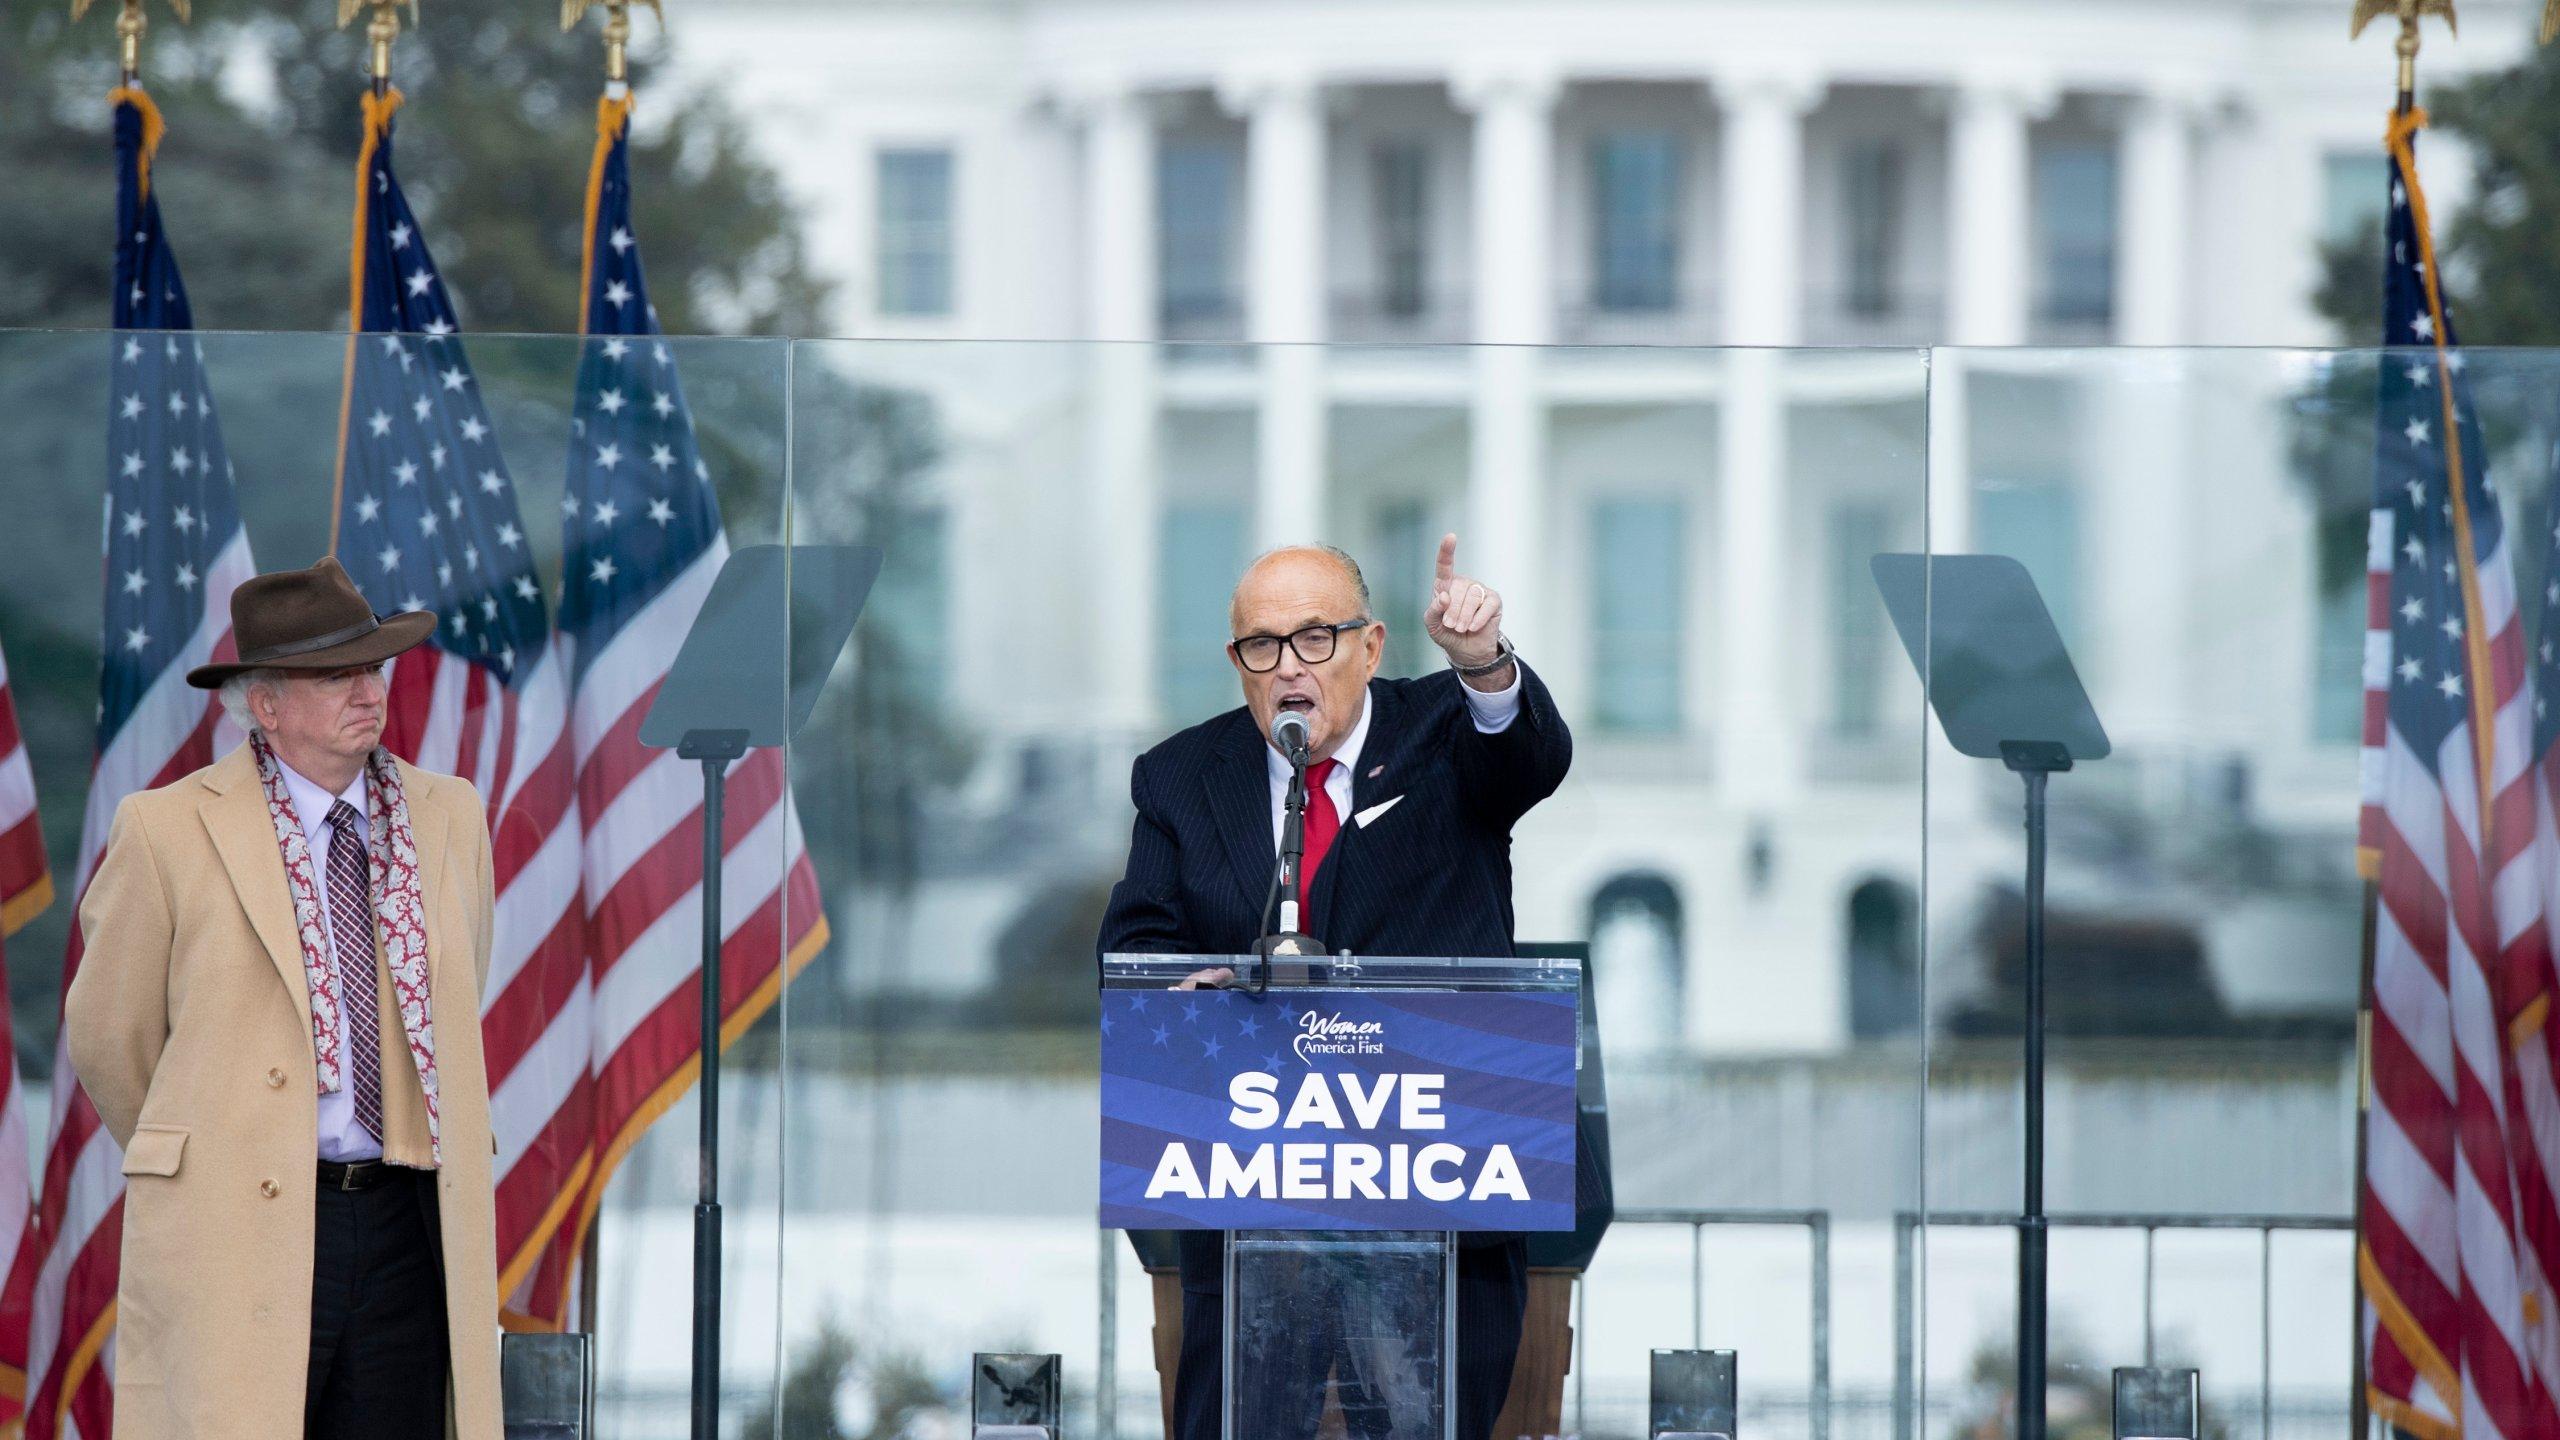 Chapman University professor John Eastman stands next to Rudy Giuliani during a rally near the White House in Washington, D.C., on Wednesday, Jan. 6, 2021. (BRENDAN SMIALOWSKI/AFP via Getty Images)